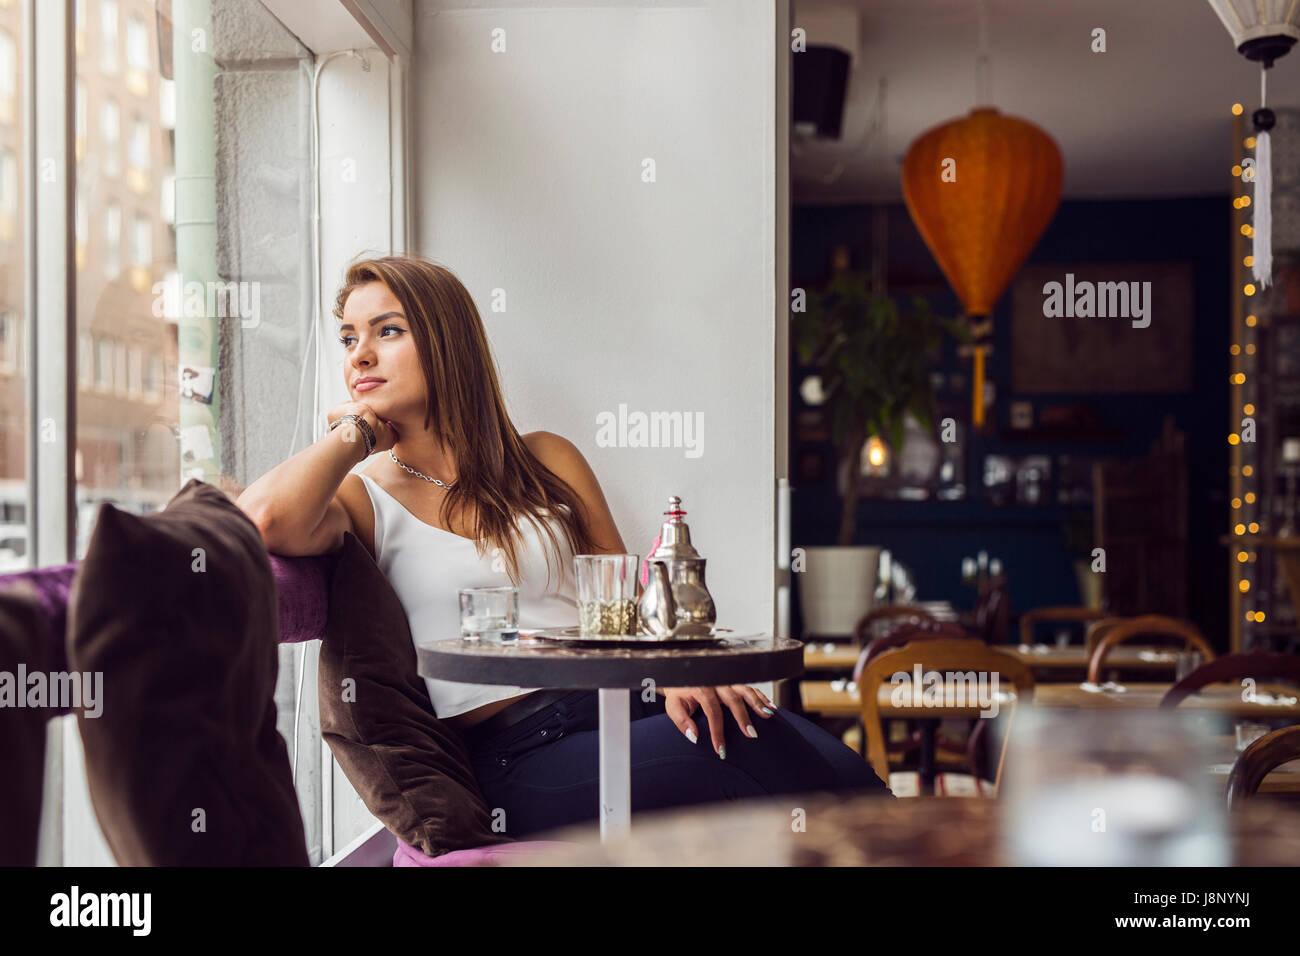 Businesswoman looking through window in restaurant Banque D'Images